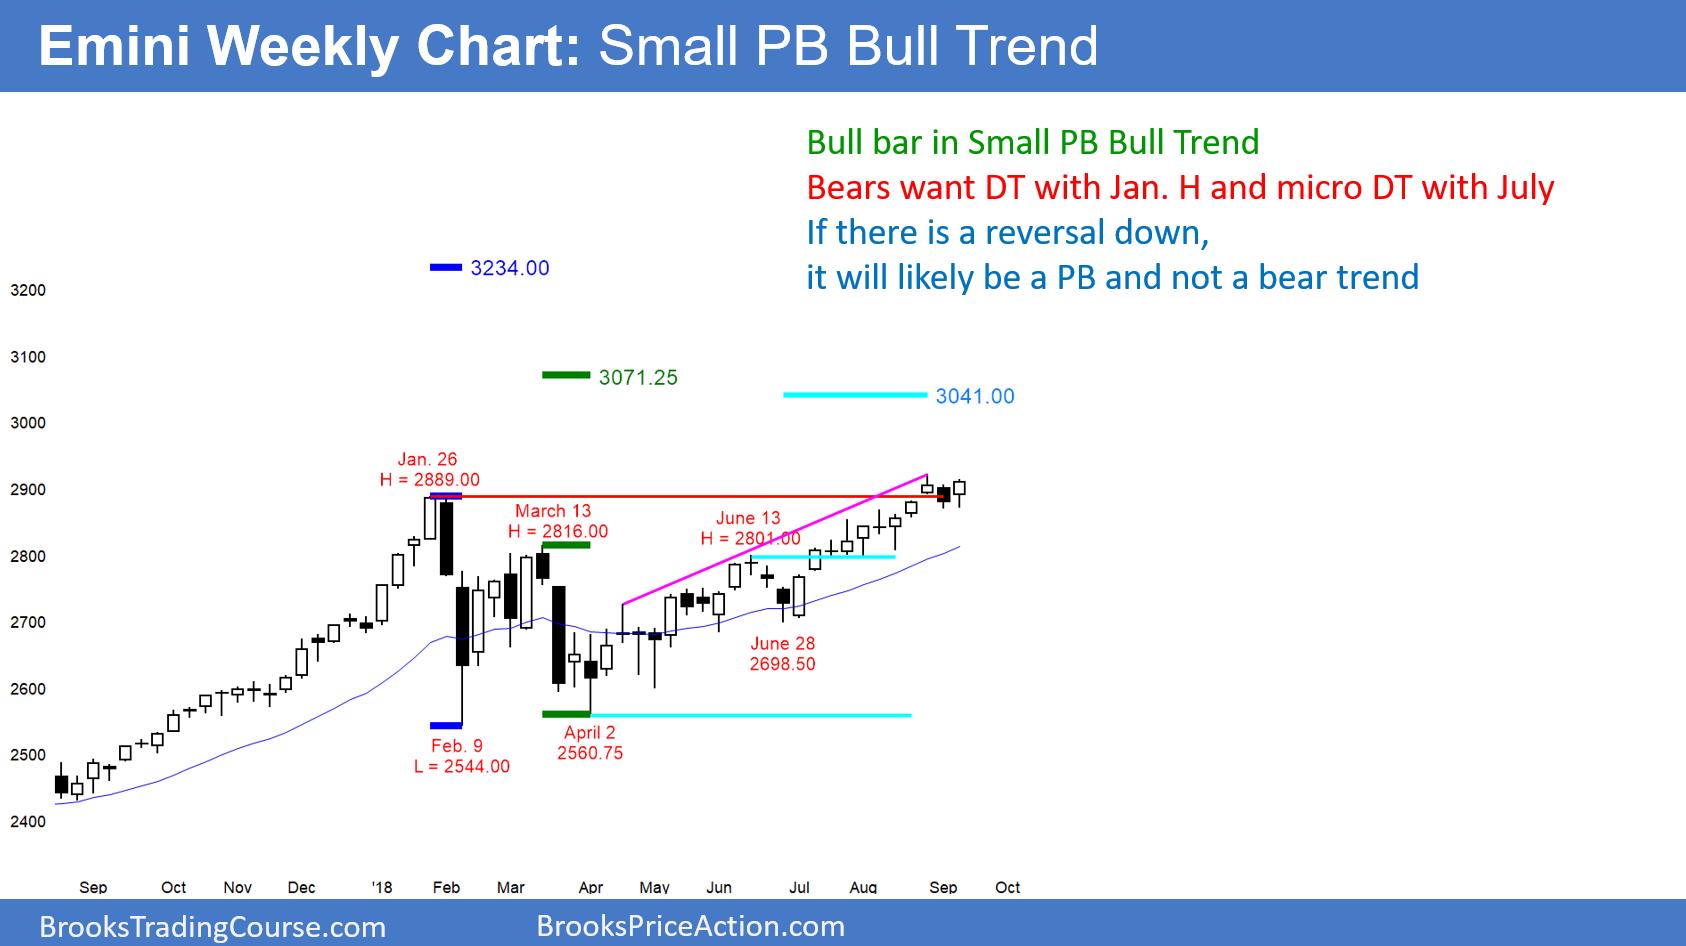 Emini Weekly Chart Small PB Bull Trend